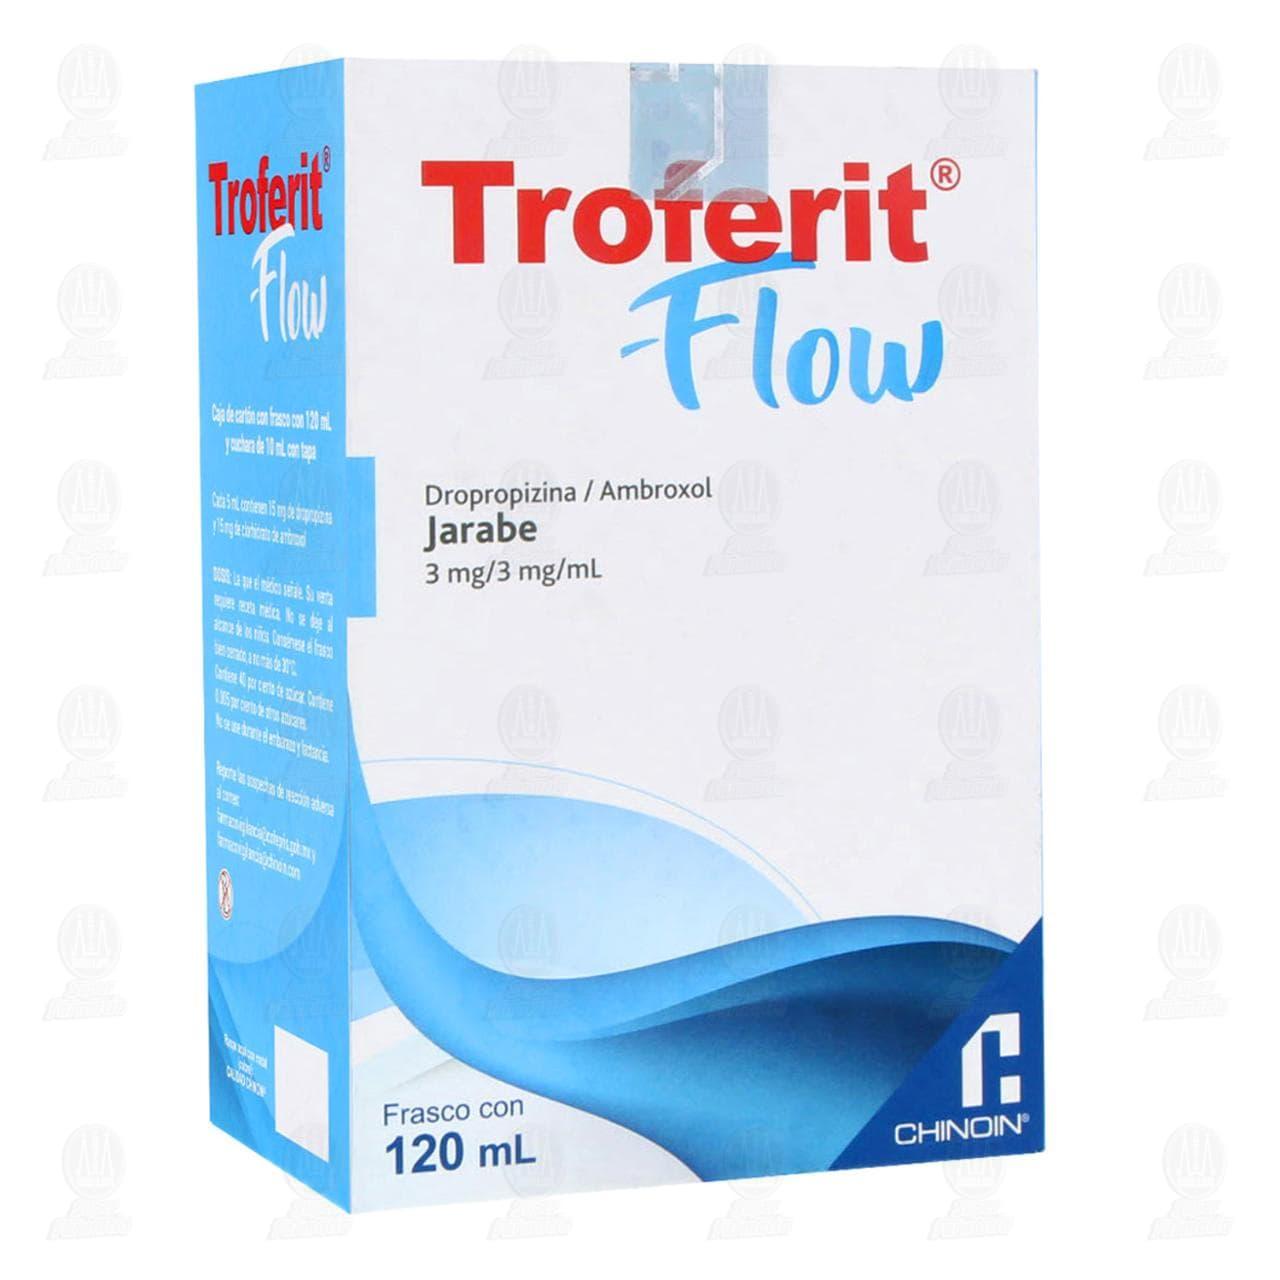 Comprar Troferit Flow Jarabe 3mg/3mg/ml 120ml en Farmacias Guadalajara